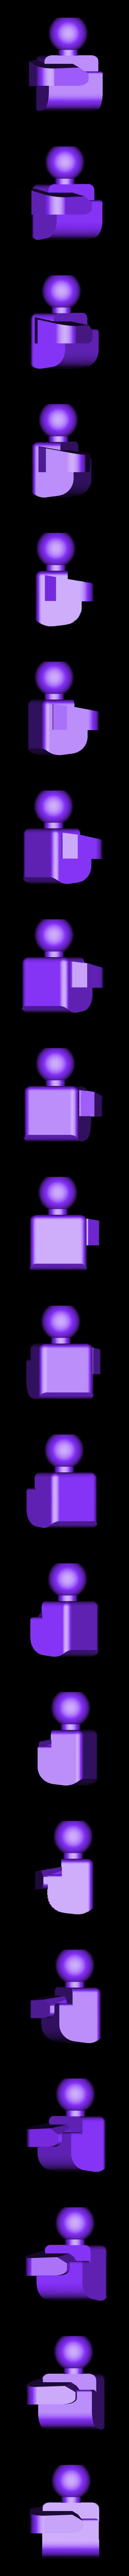 hand_right.stl Download free STL file ChainClip. Robocreatures parts • 3D print object, ferjerez3d